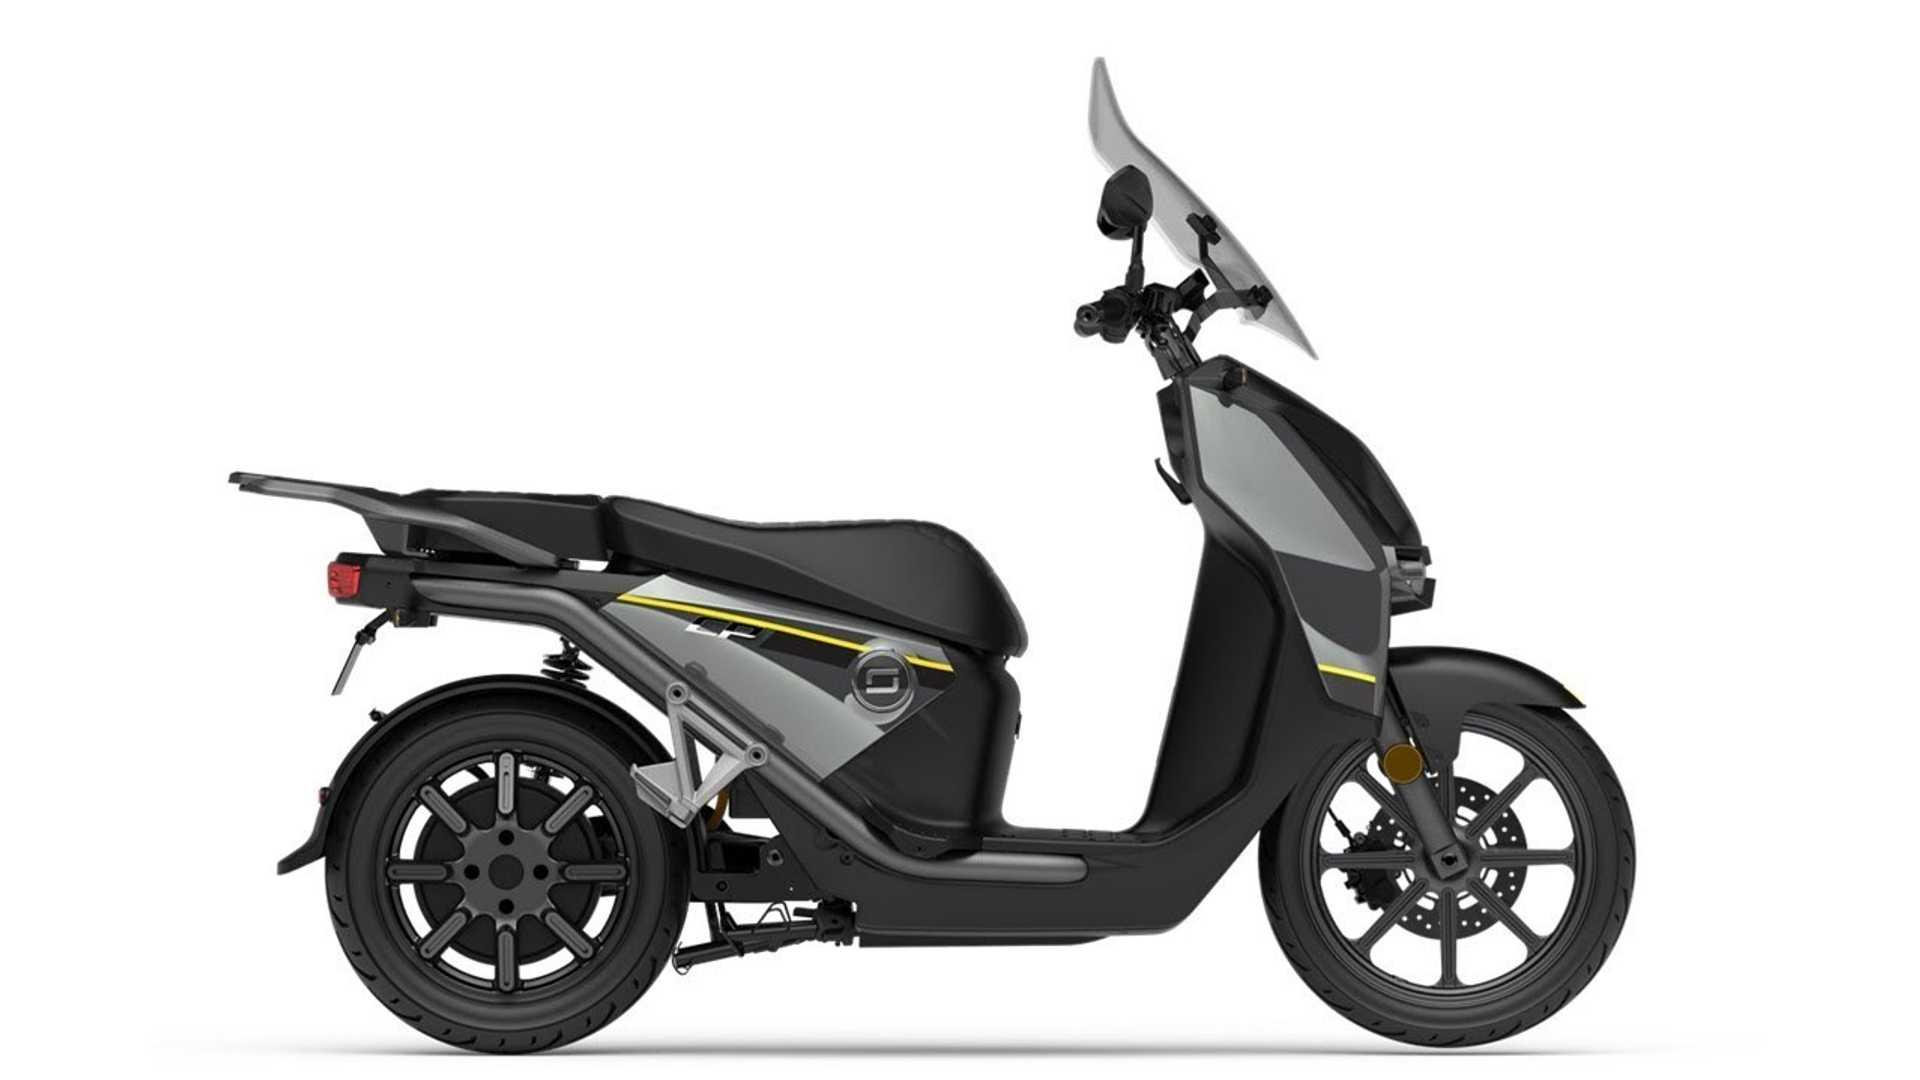 Super Soco CPx scooter